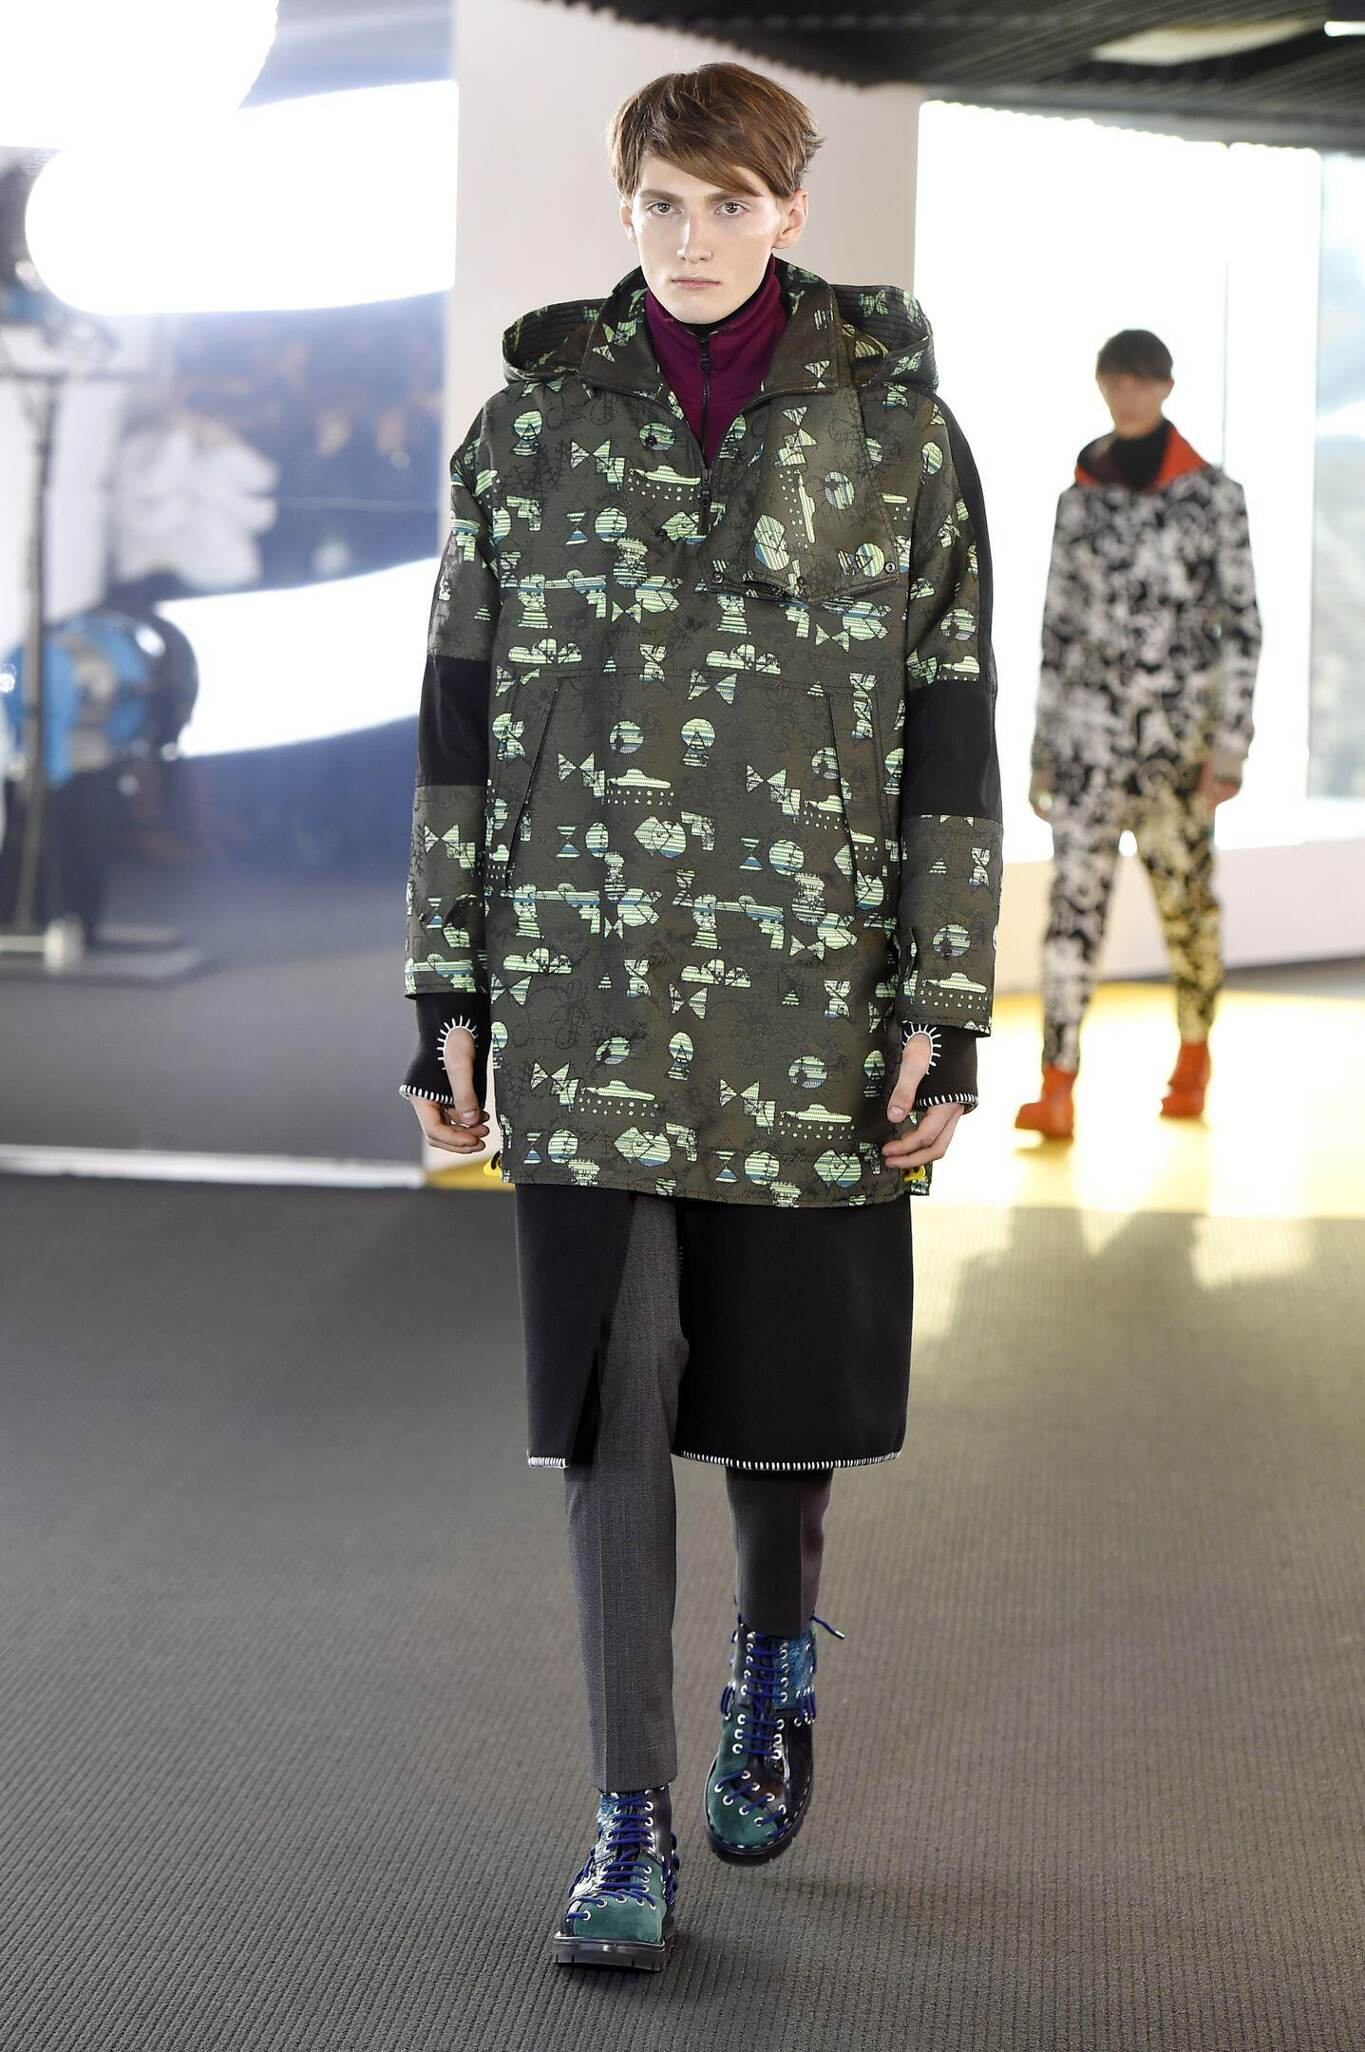 Kenzo Fall Winter 2015 16 Mens Collection Paris Fashion Week